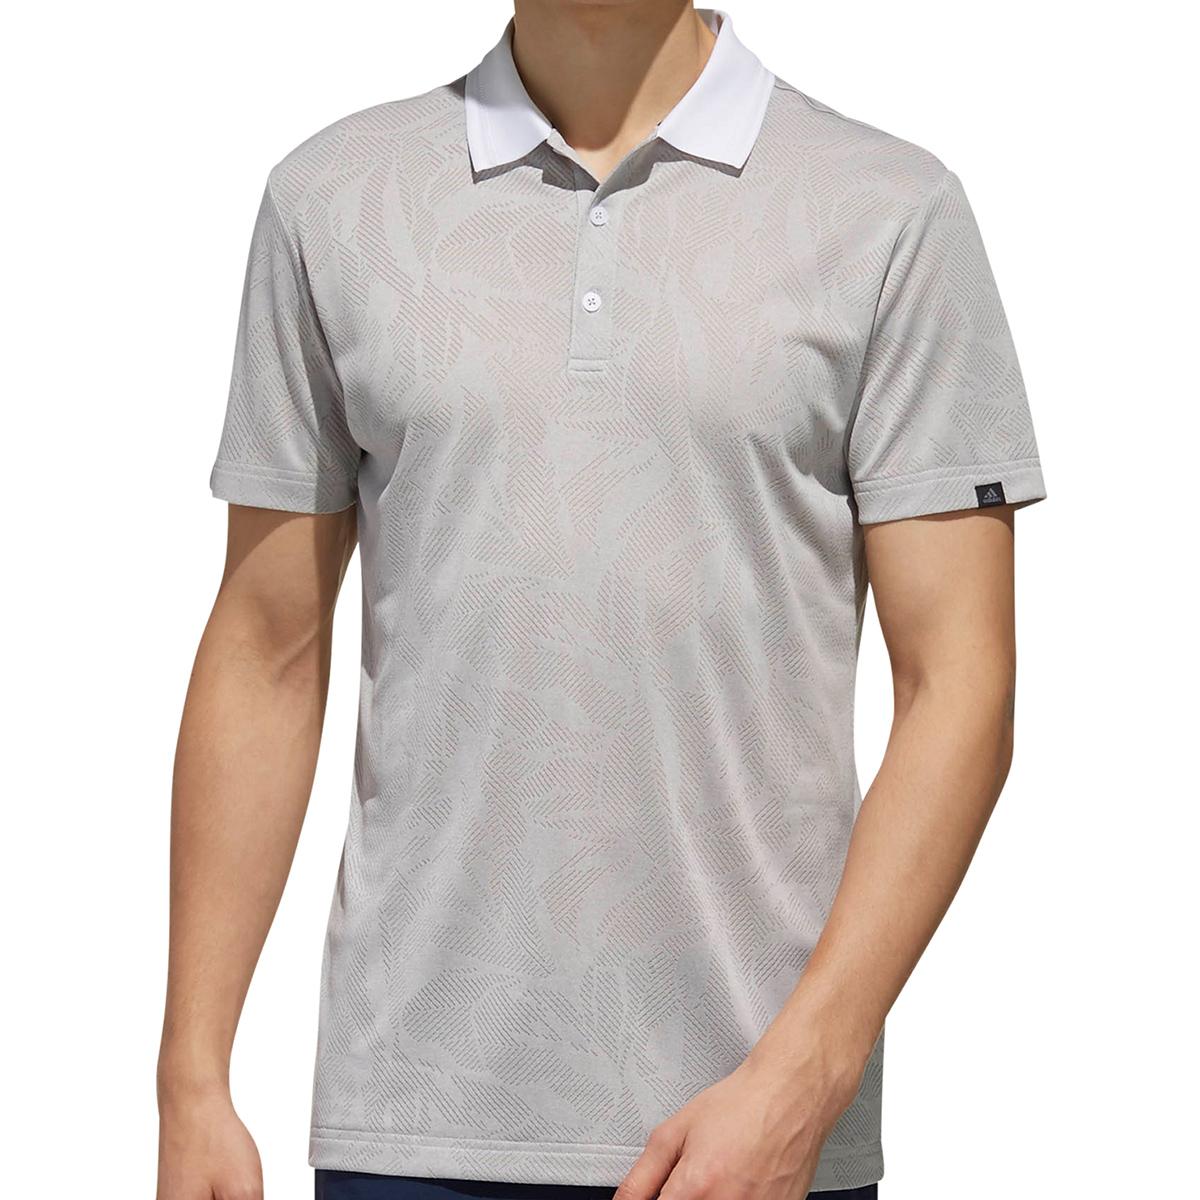 ADICROSS ボタニカル半袖ポロシャツ